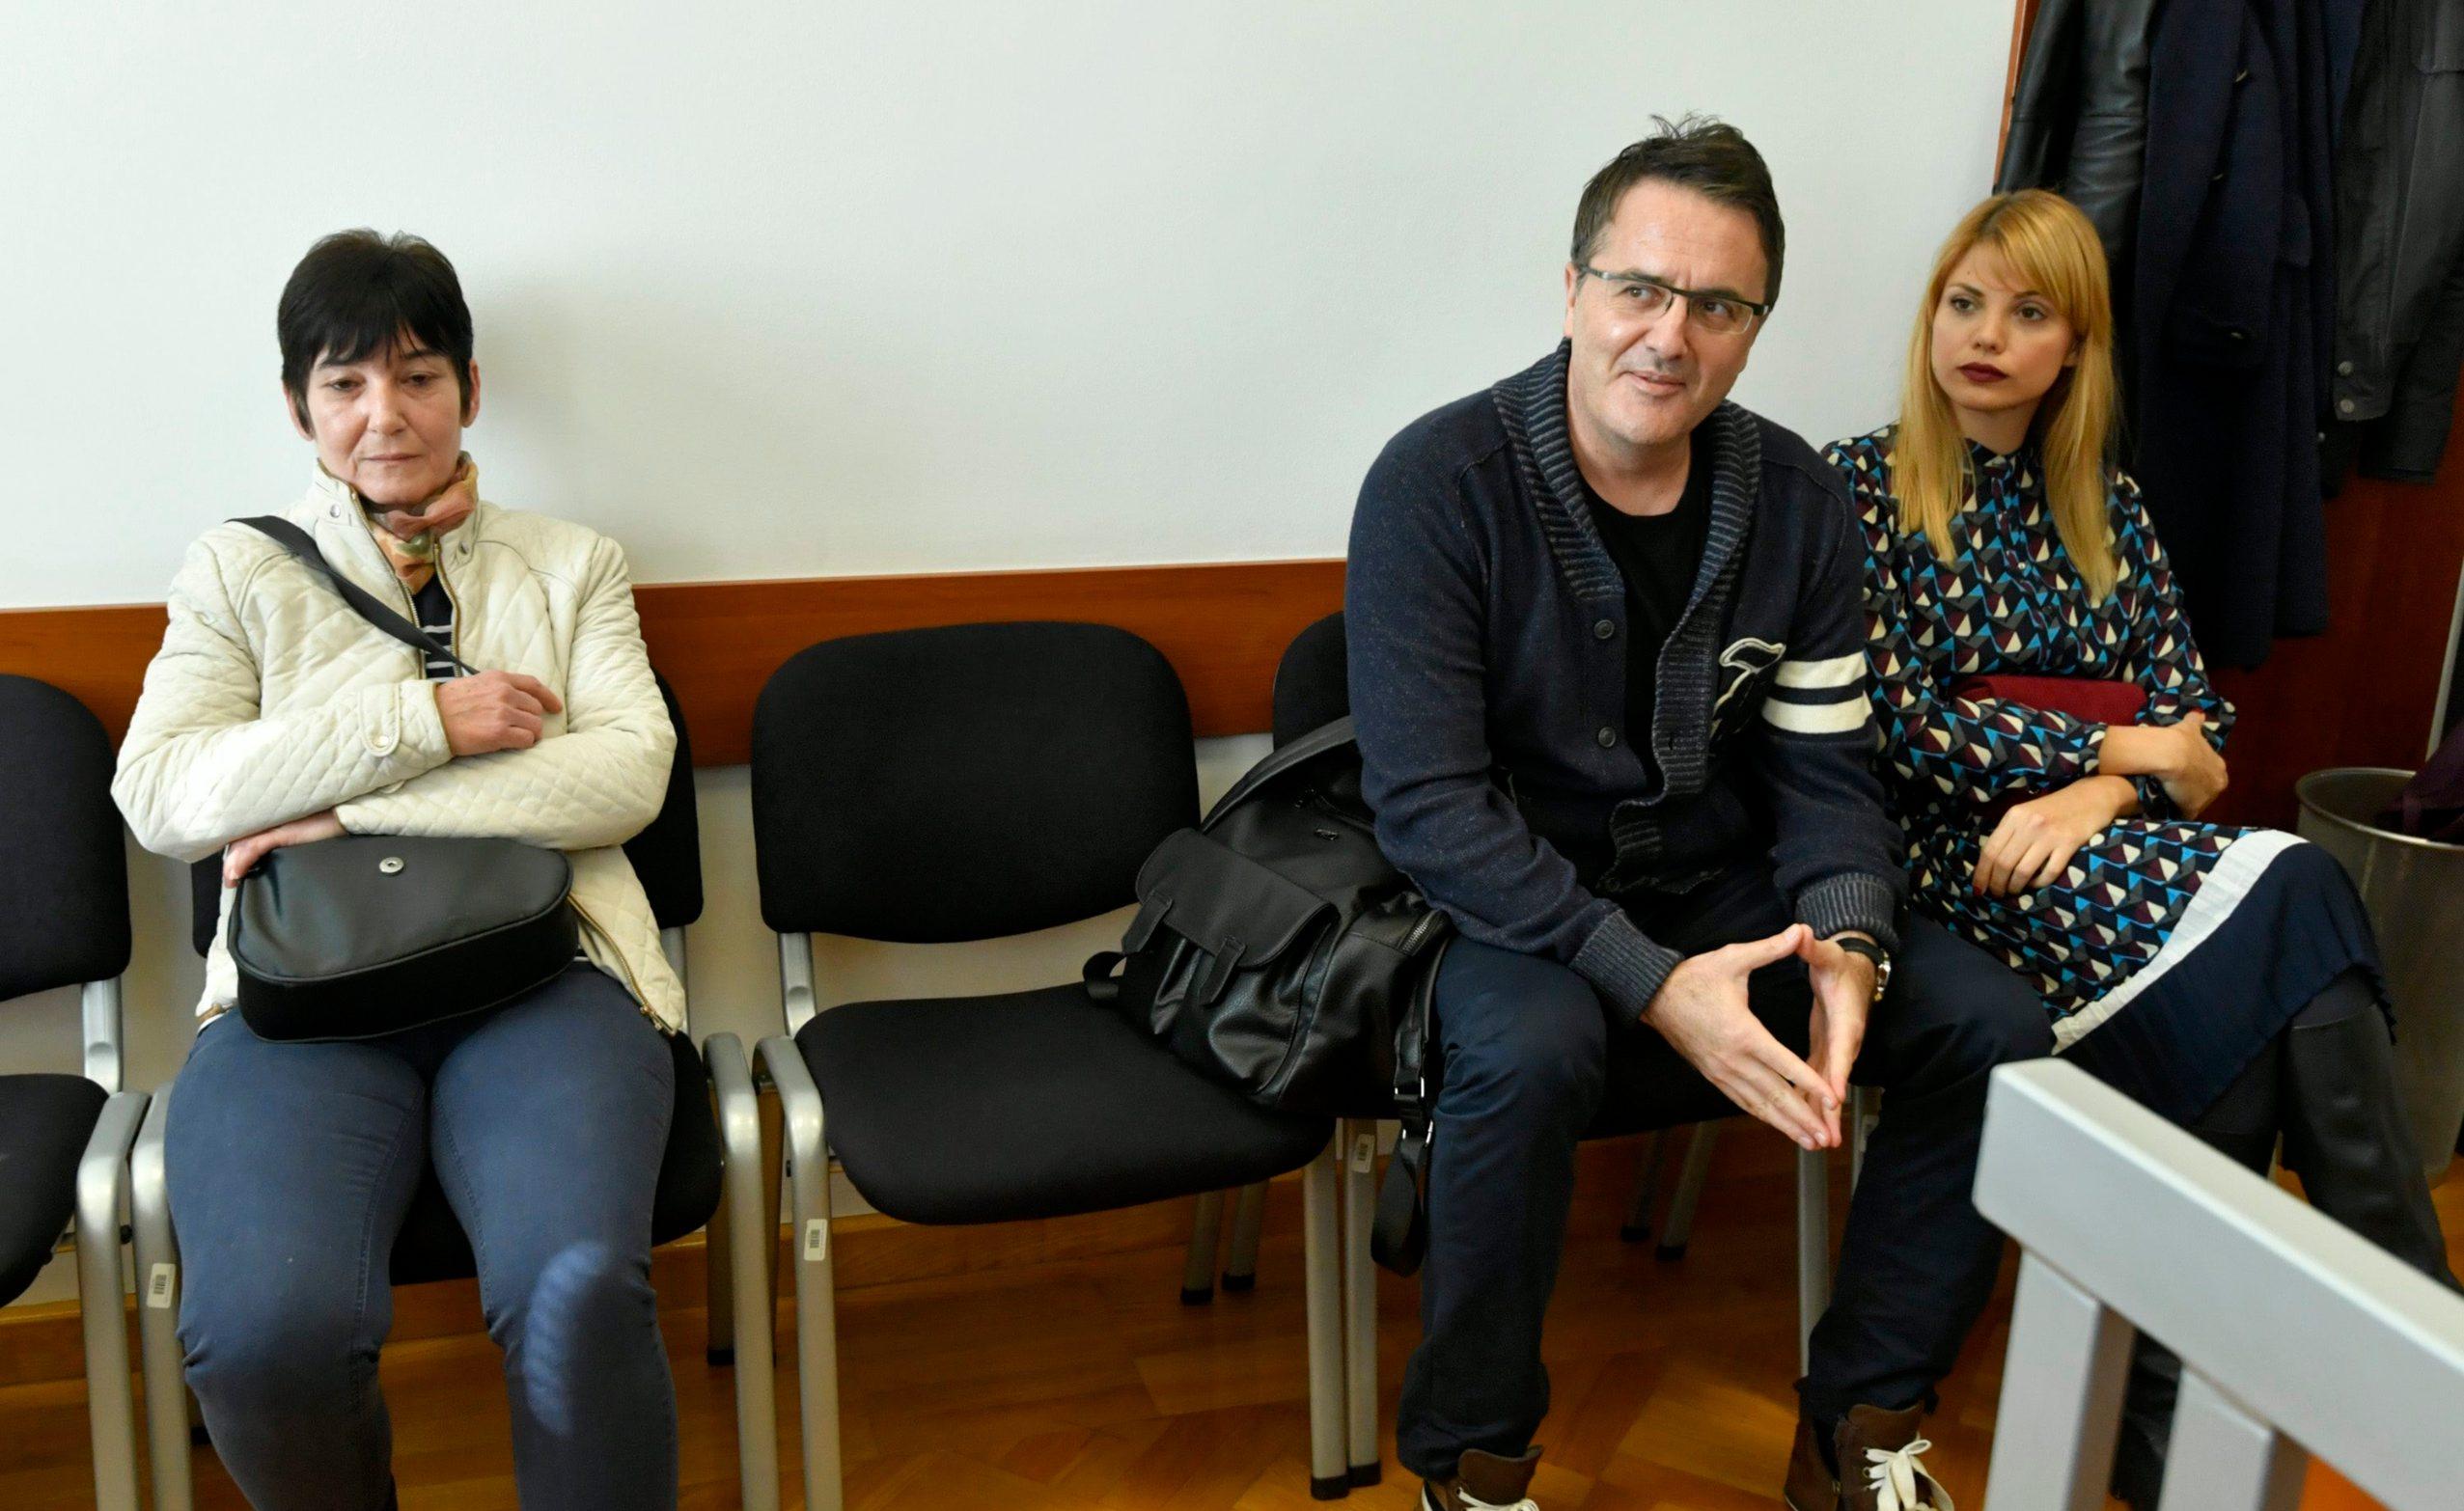 Anica Jurilj, Tarik i Lejla Filipović